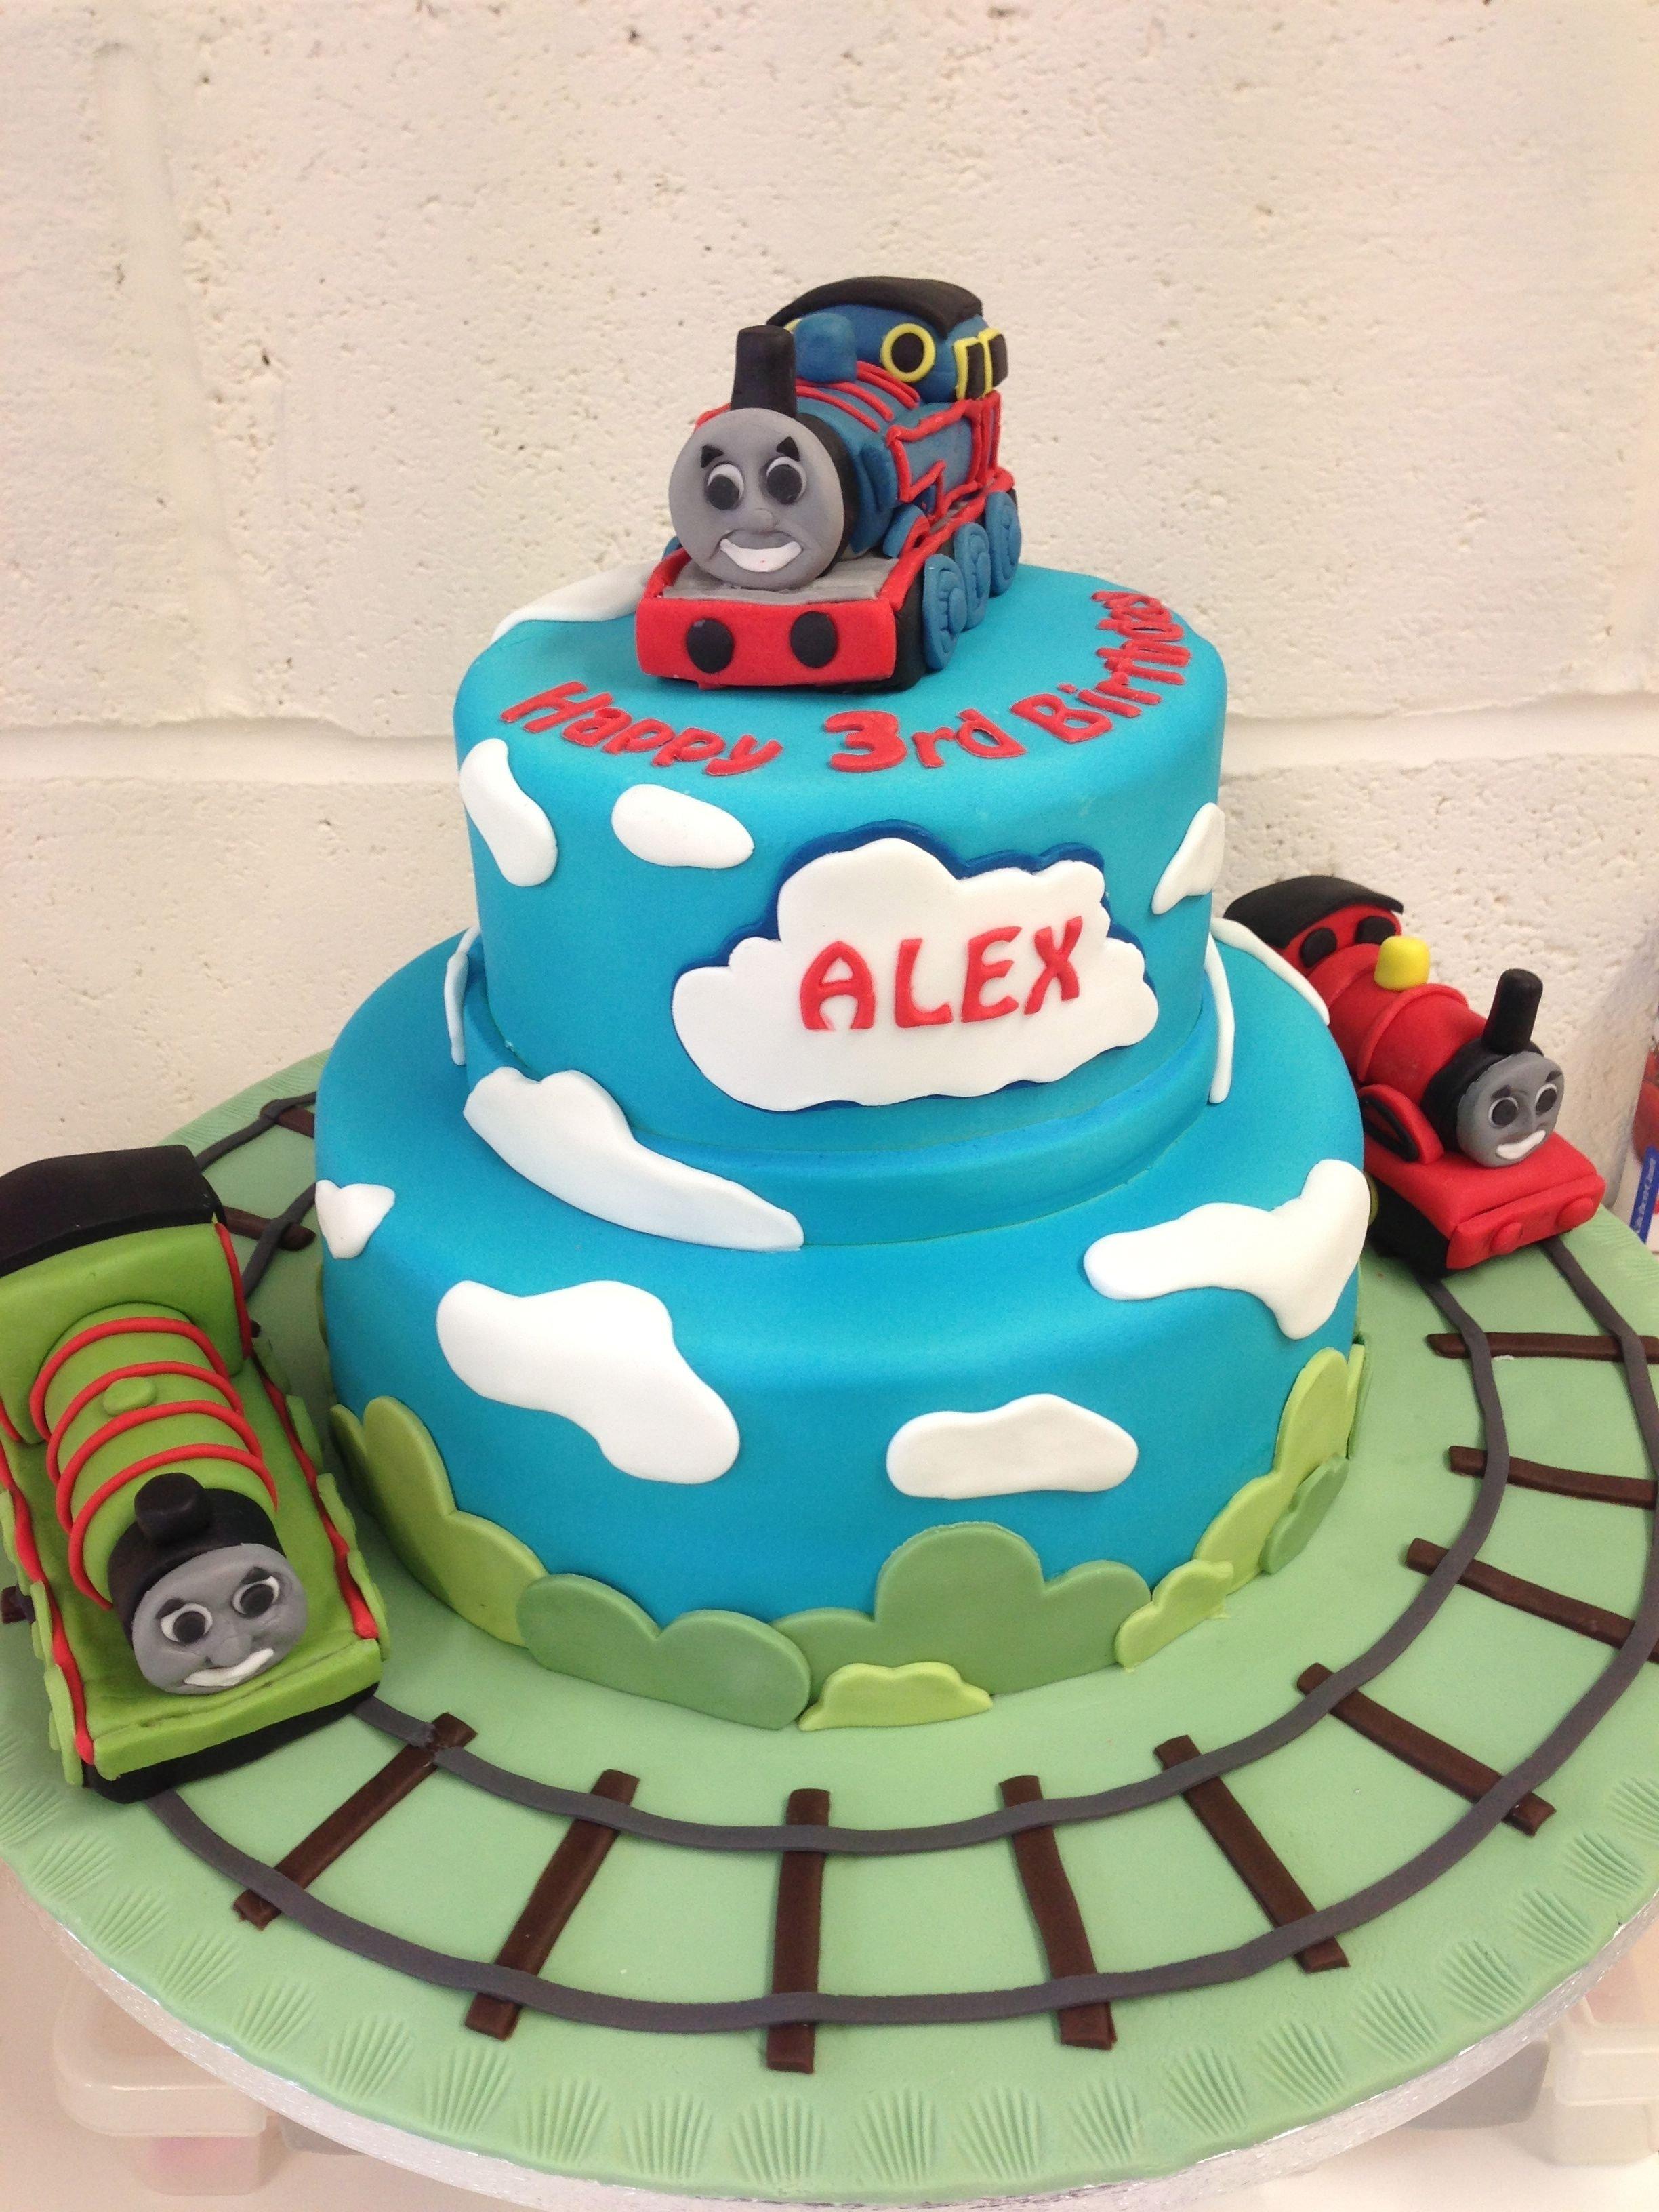 10 Nice Thomas And Friends Cake Ideas thomas and friends cake google search diegos 2nd bday thomas